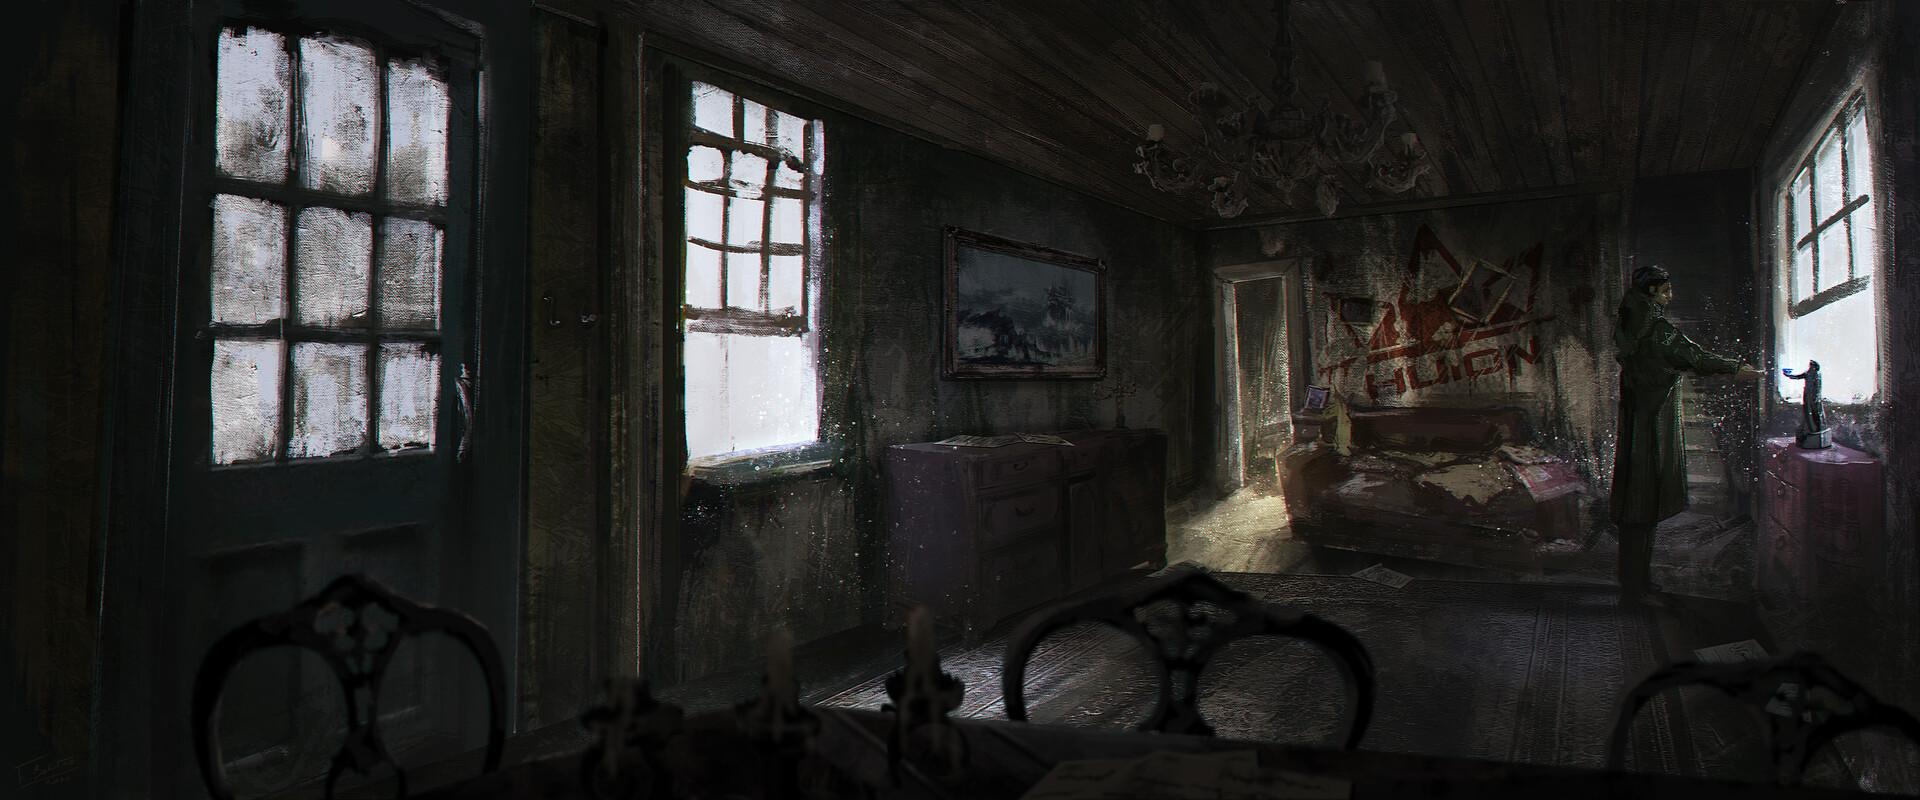 Huion abandoned house